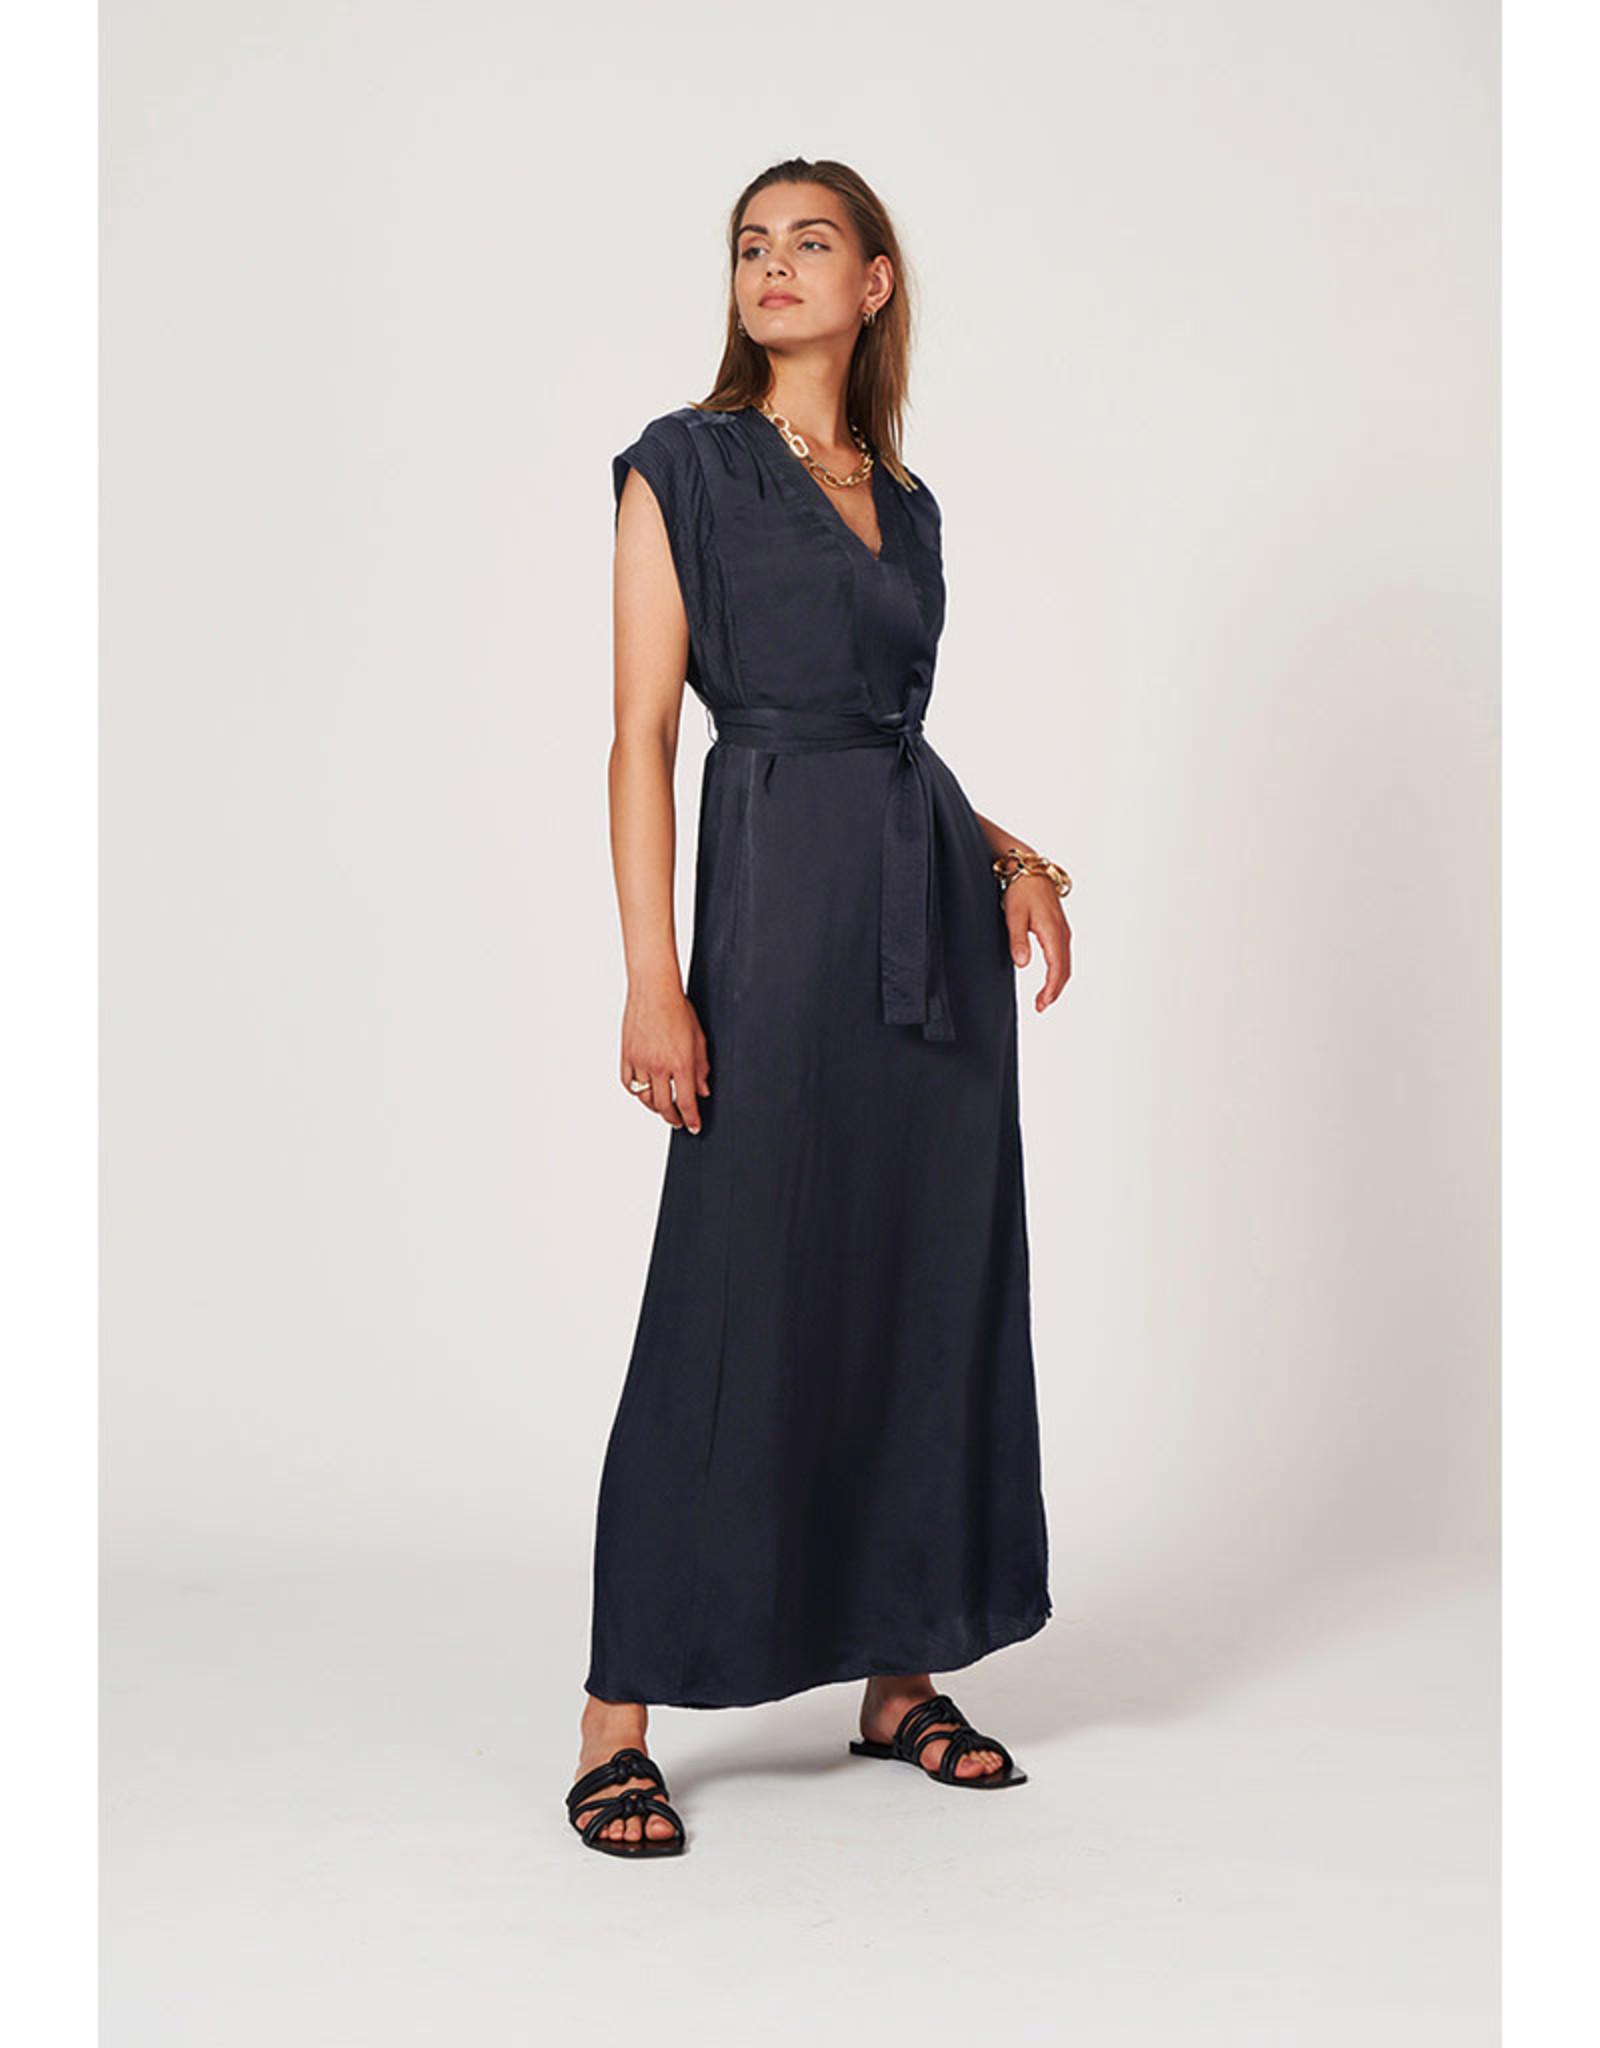 dante6 Jasiel Dress